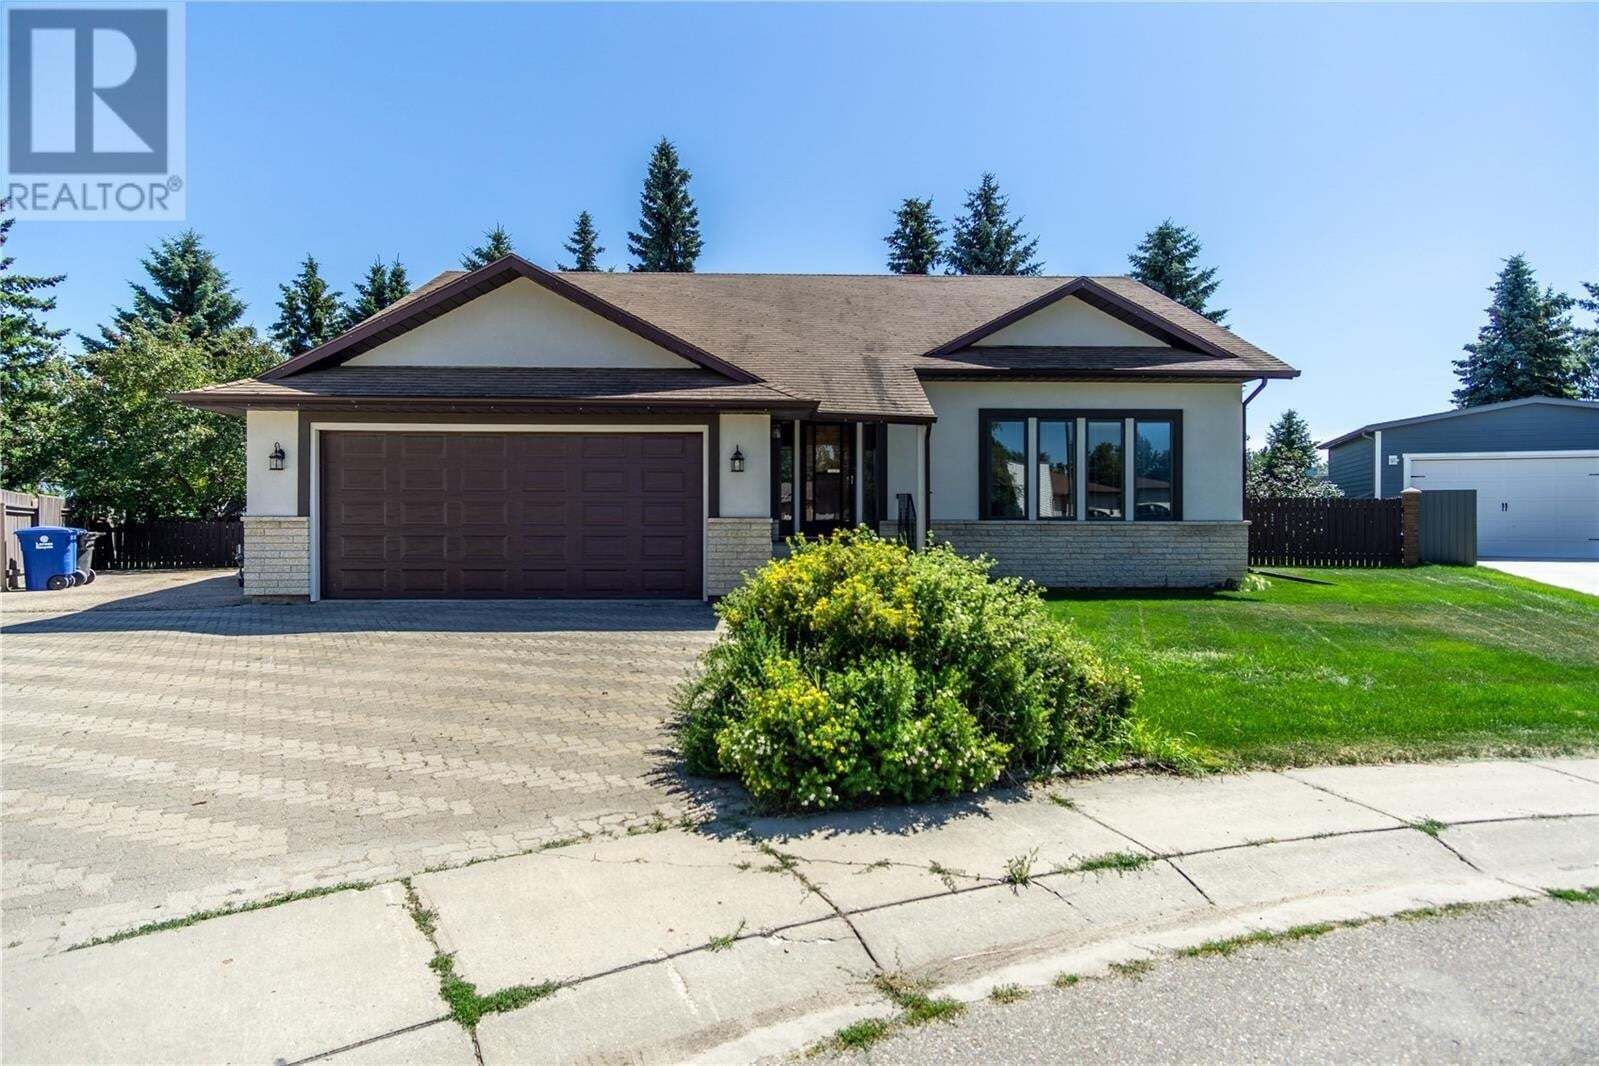 House for sale at 314 Spencer Pl Saskatoon Saskatchewan - MLS: SK818723